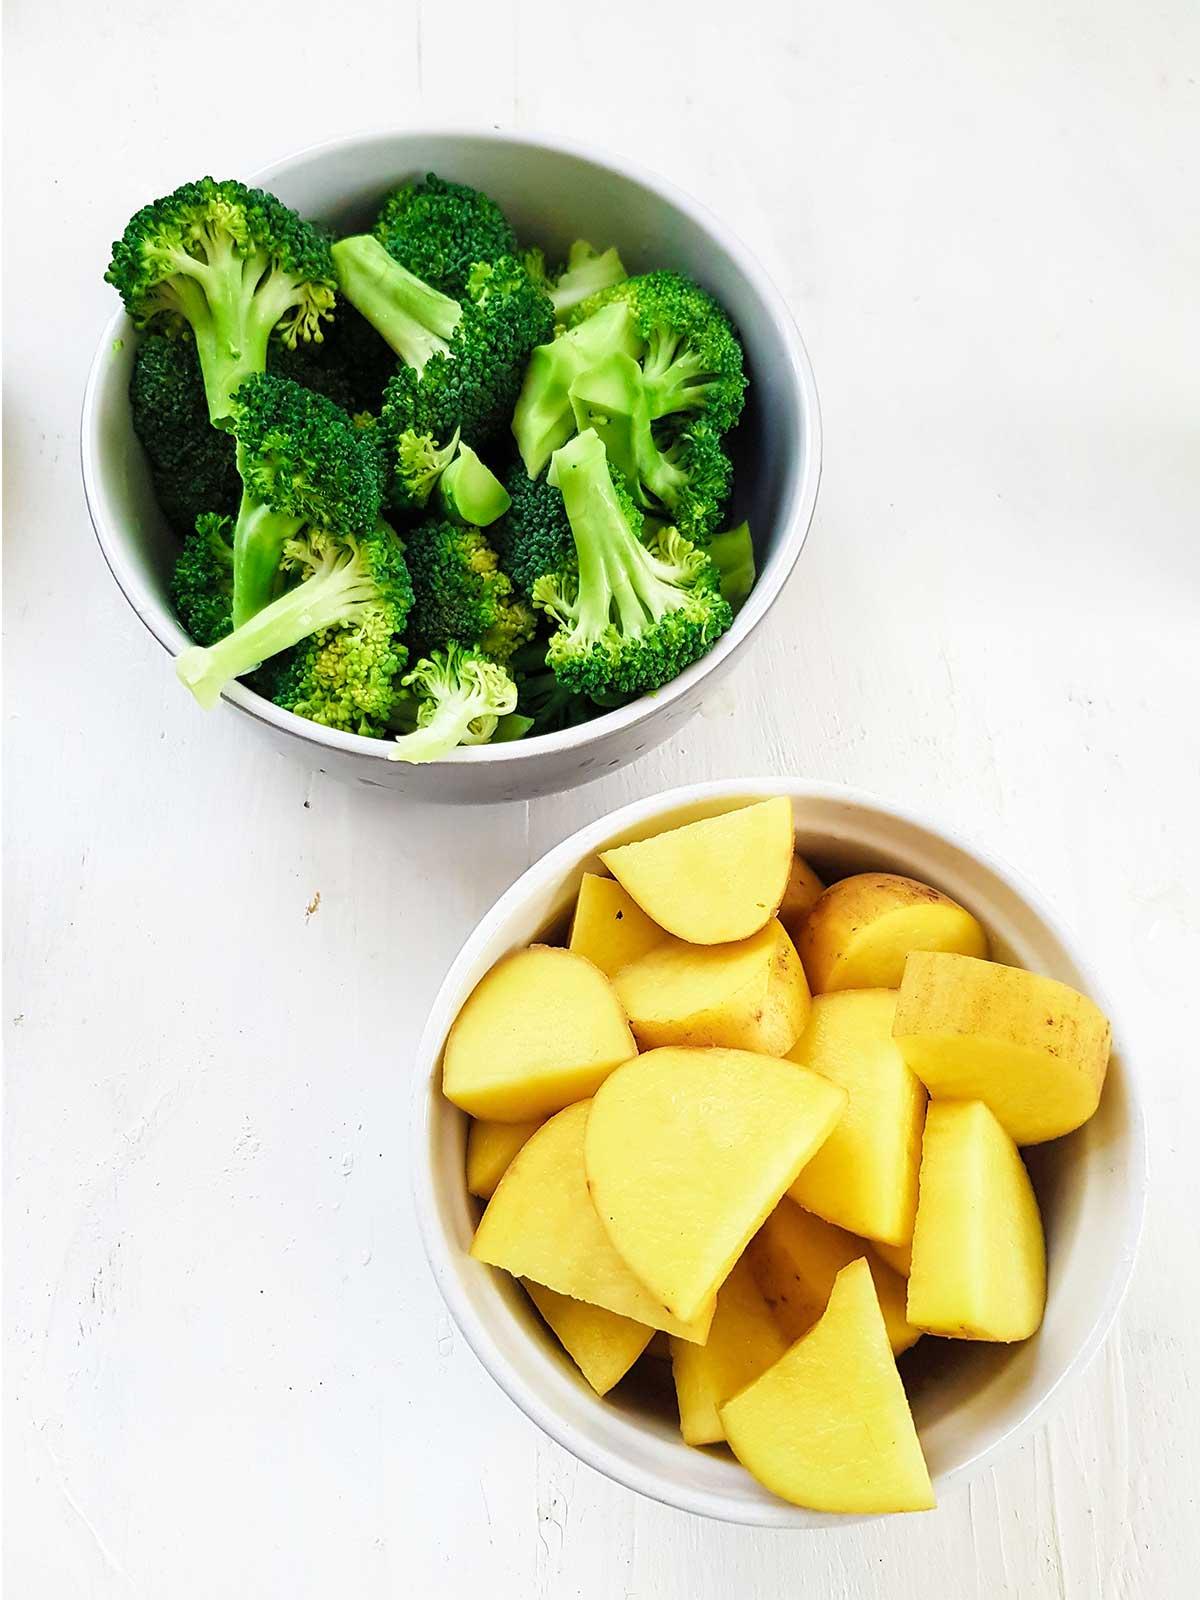 sliced potatoes and broccoli florets